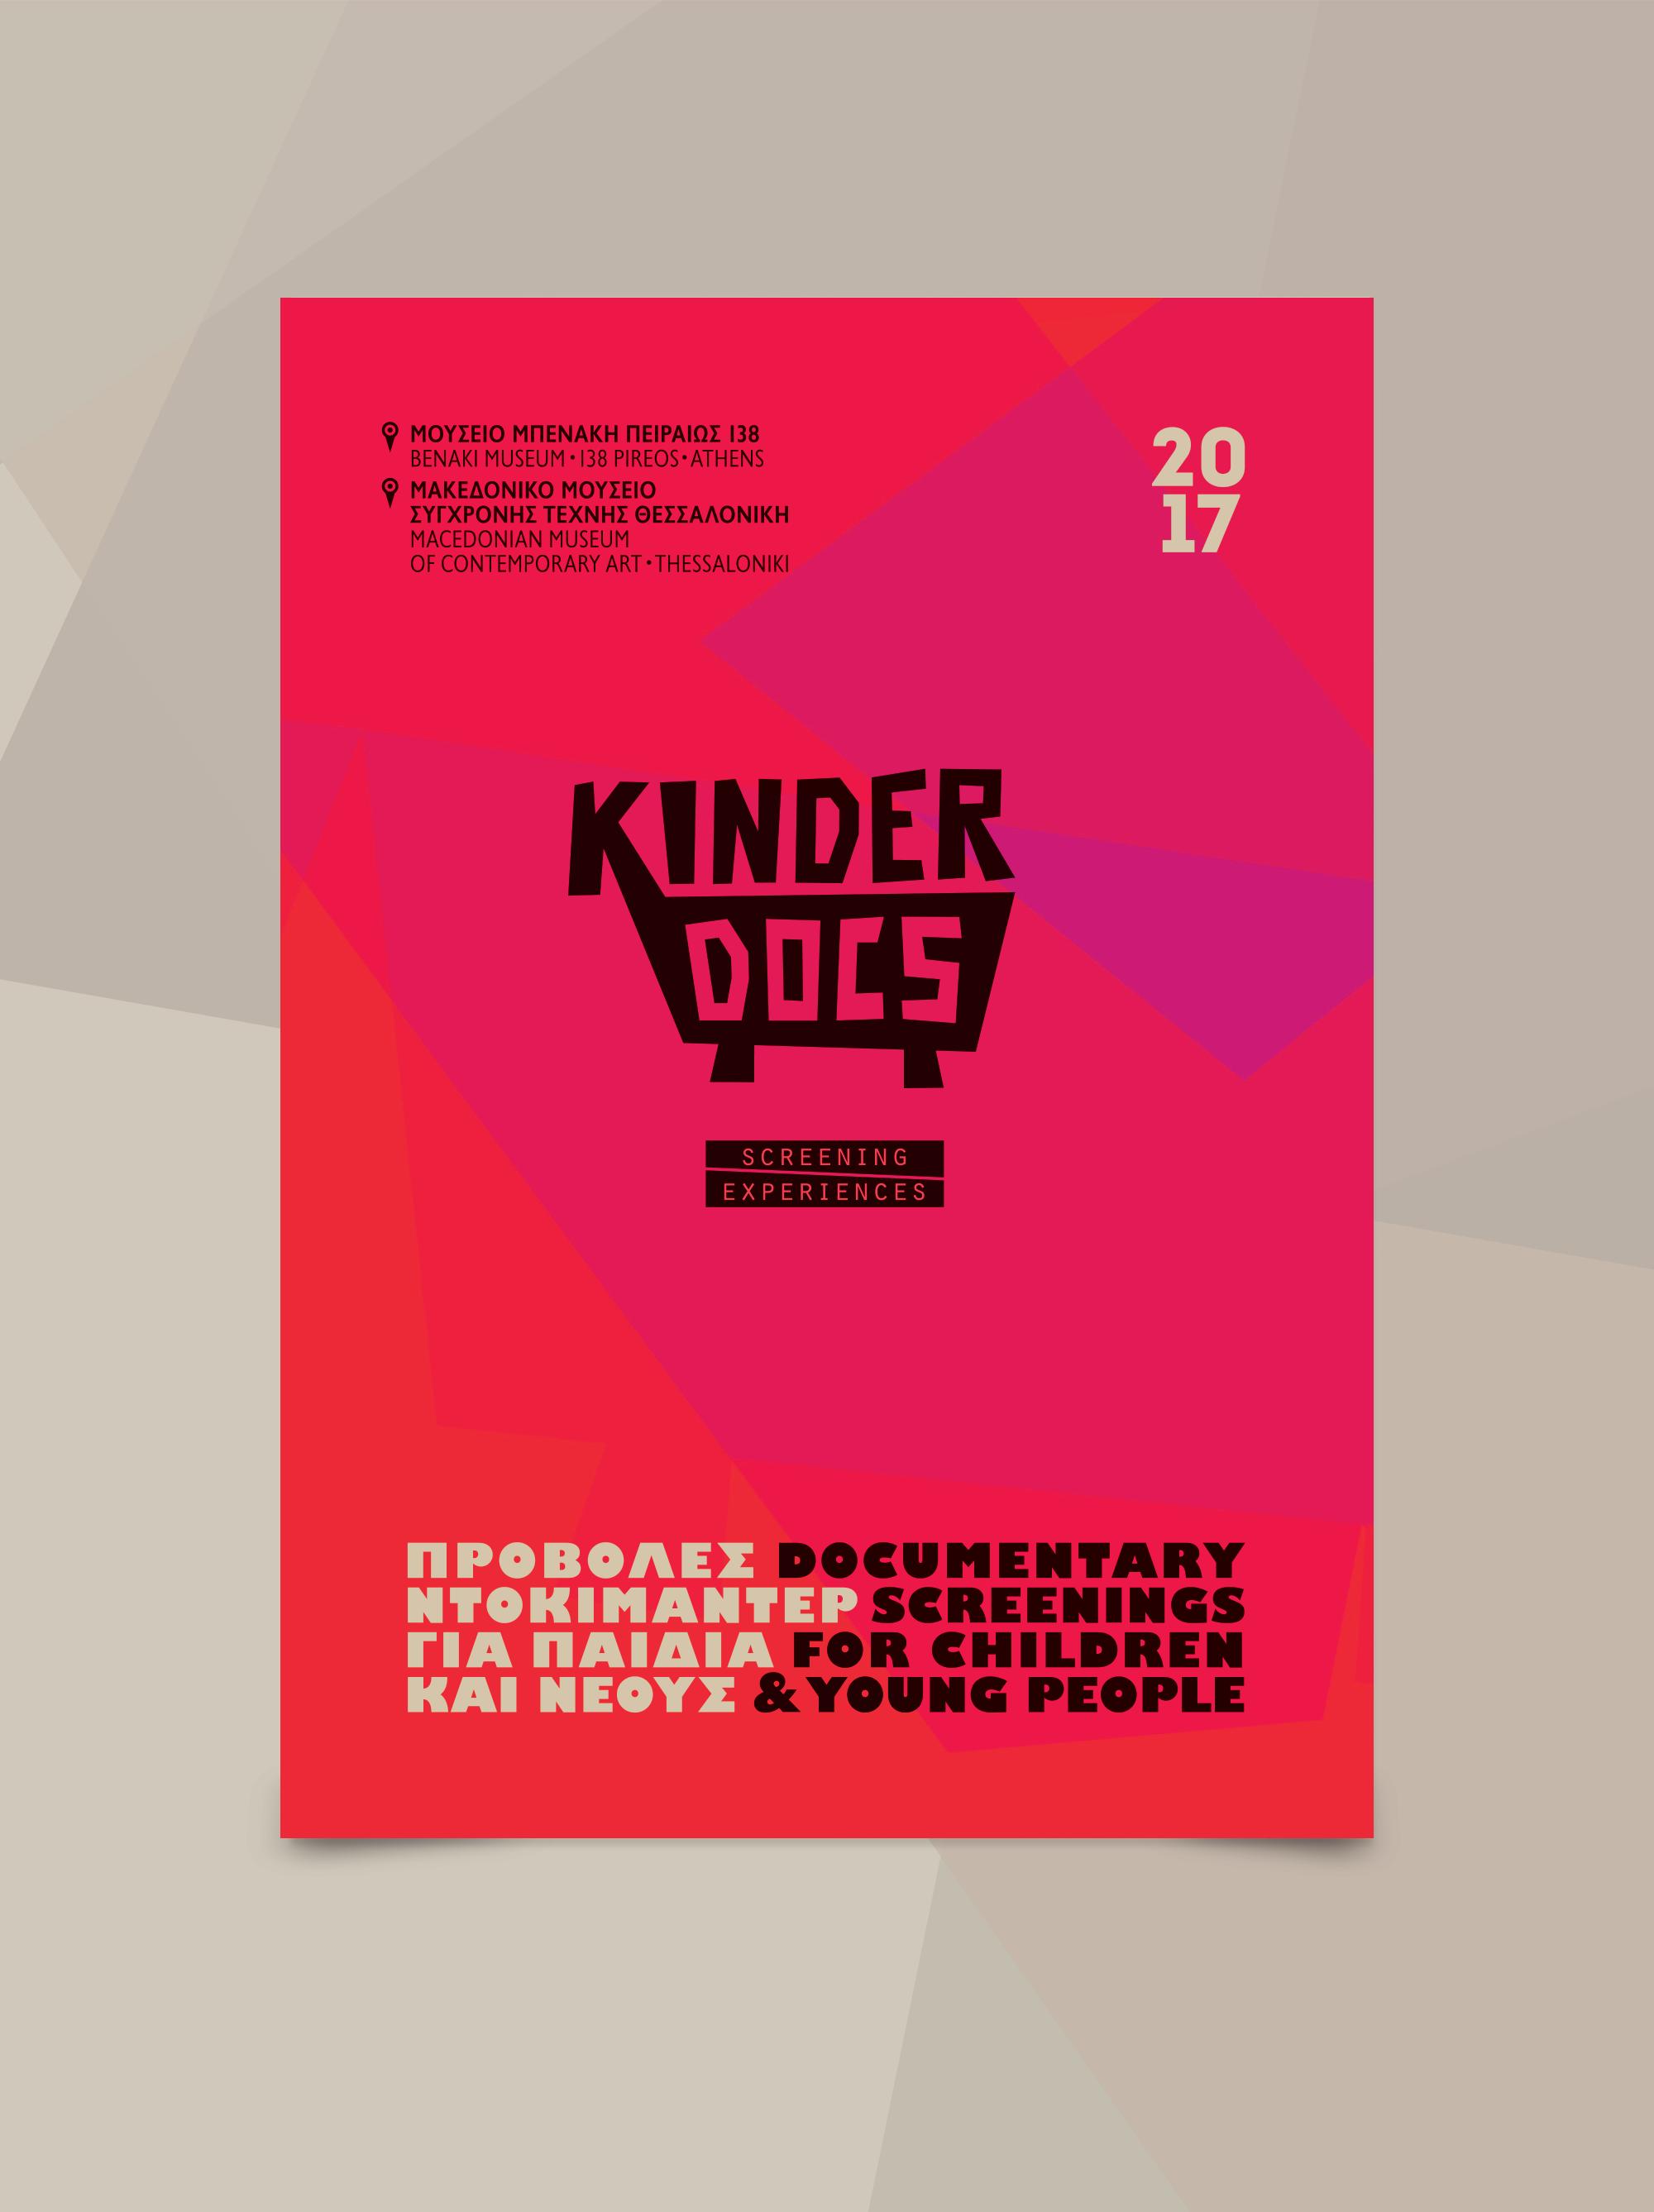 kinderdocs poster zazdesign